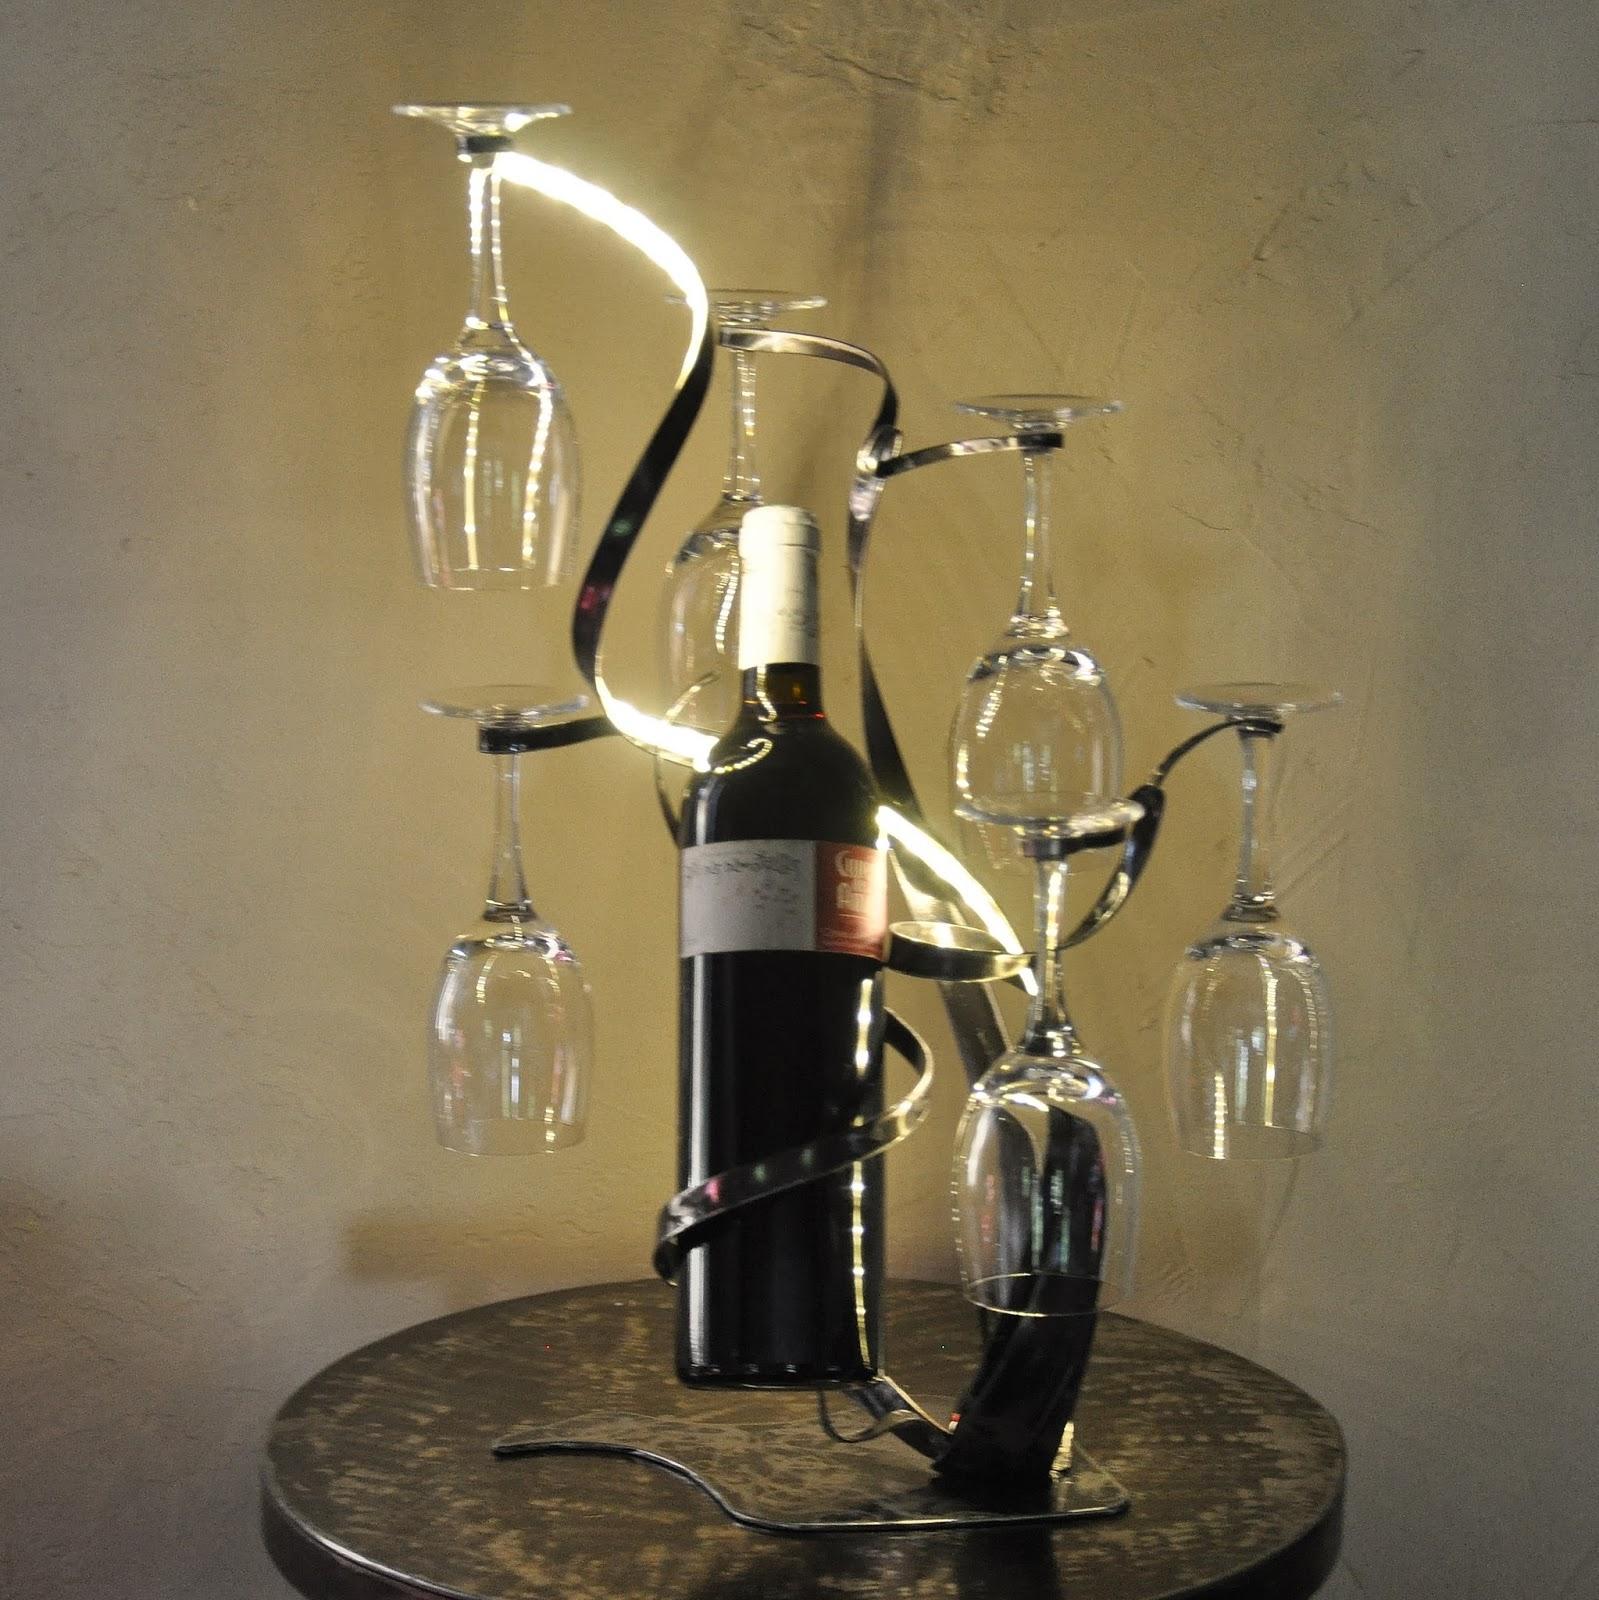 cr ateur d 39 objets d co en fer forg bougeoirs luminaires porte bouteille porte bouteille. Black Bedroom Furniture Sets. Home Design Ideas